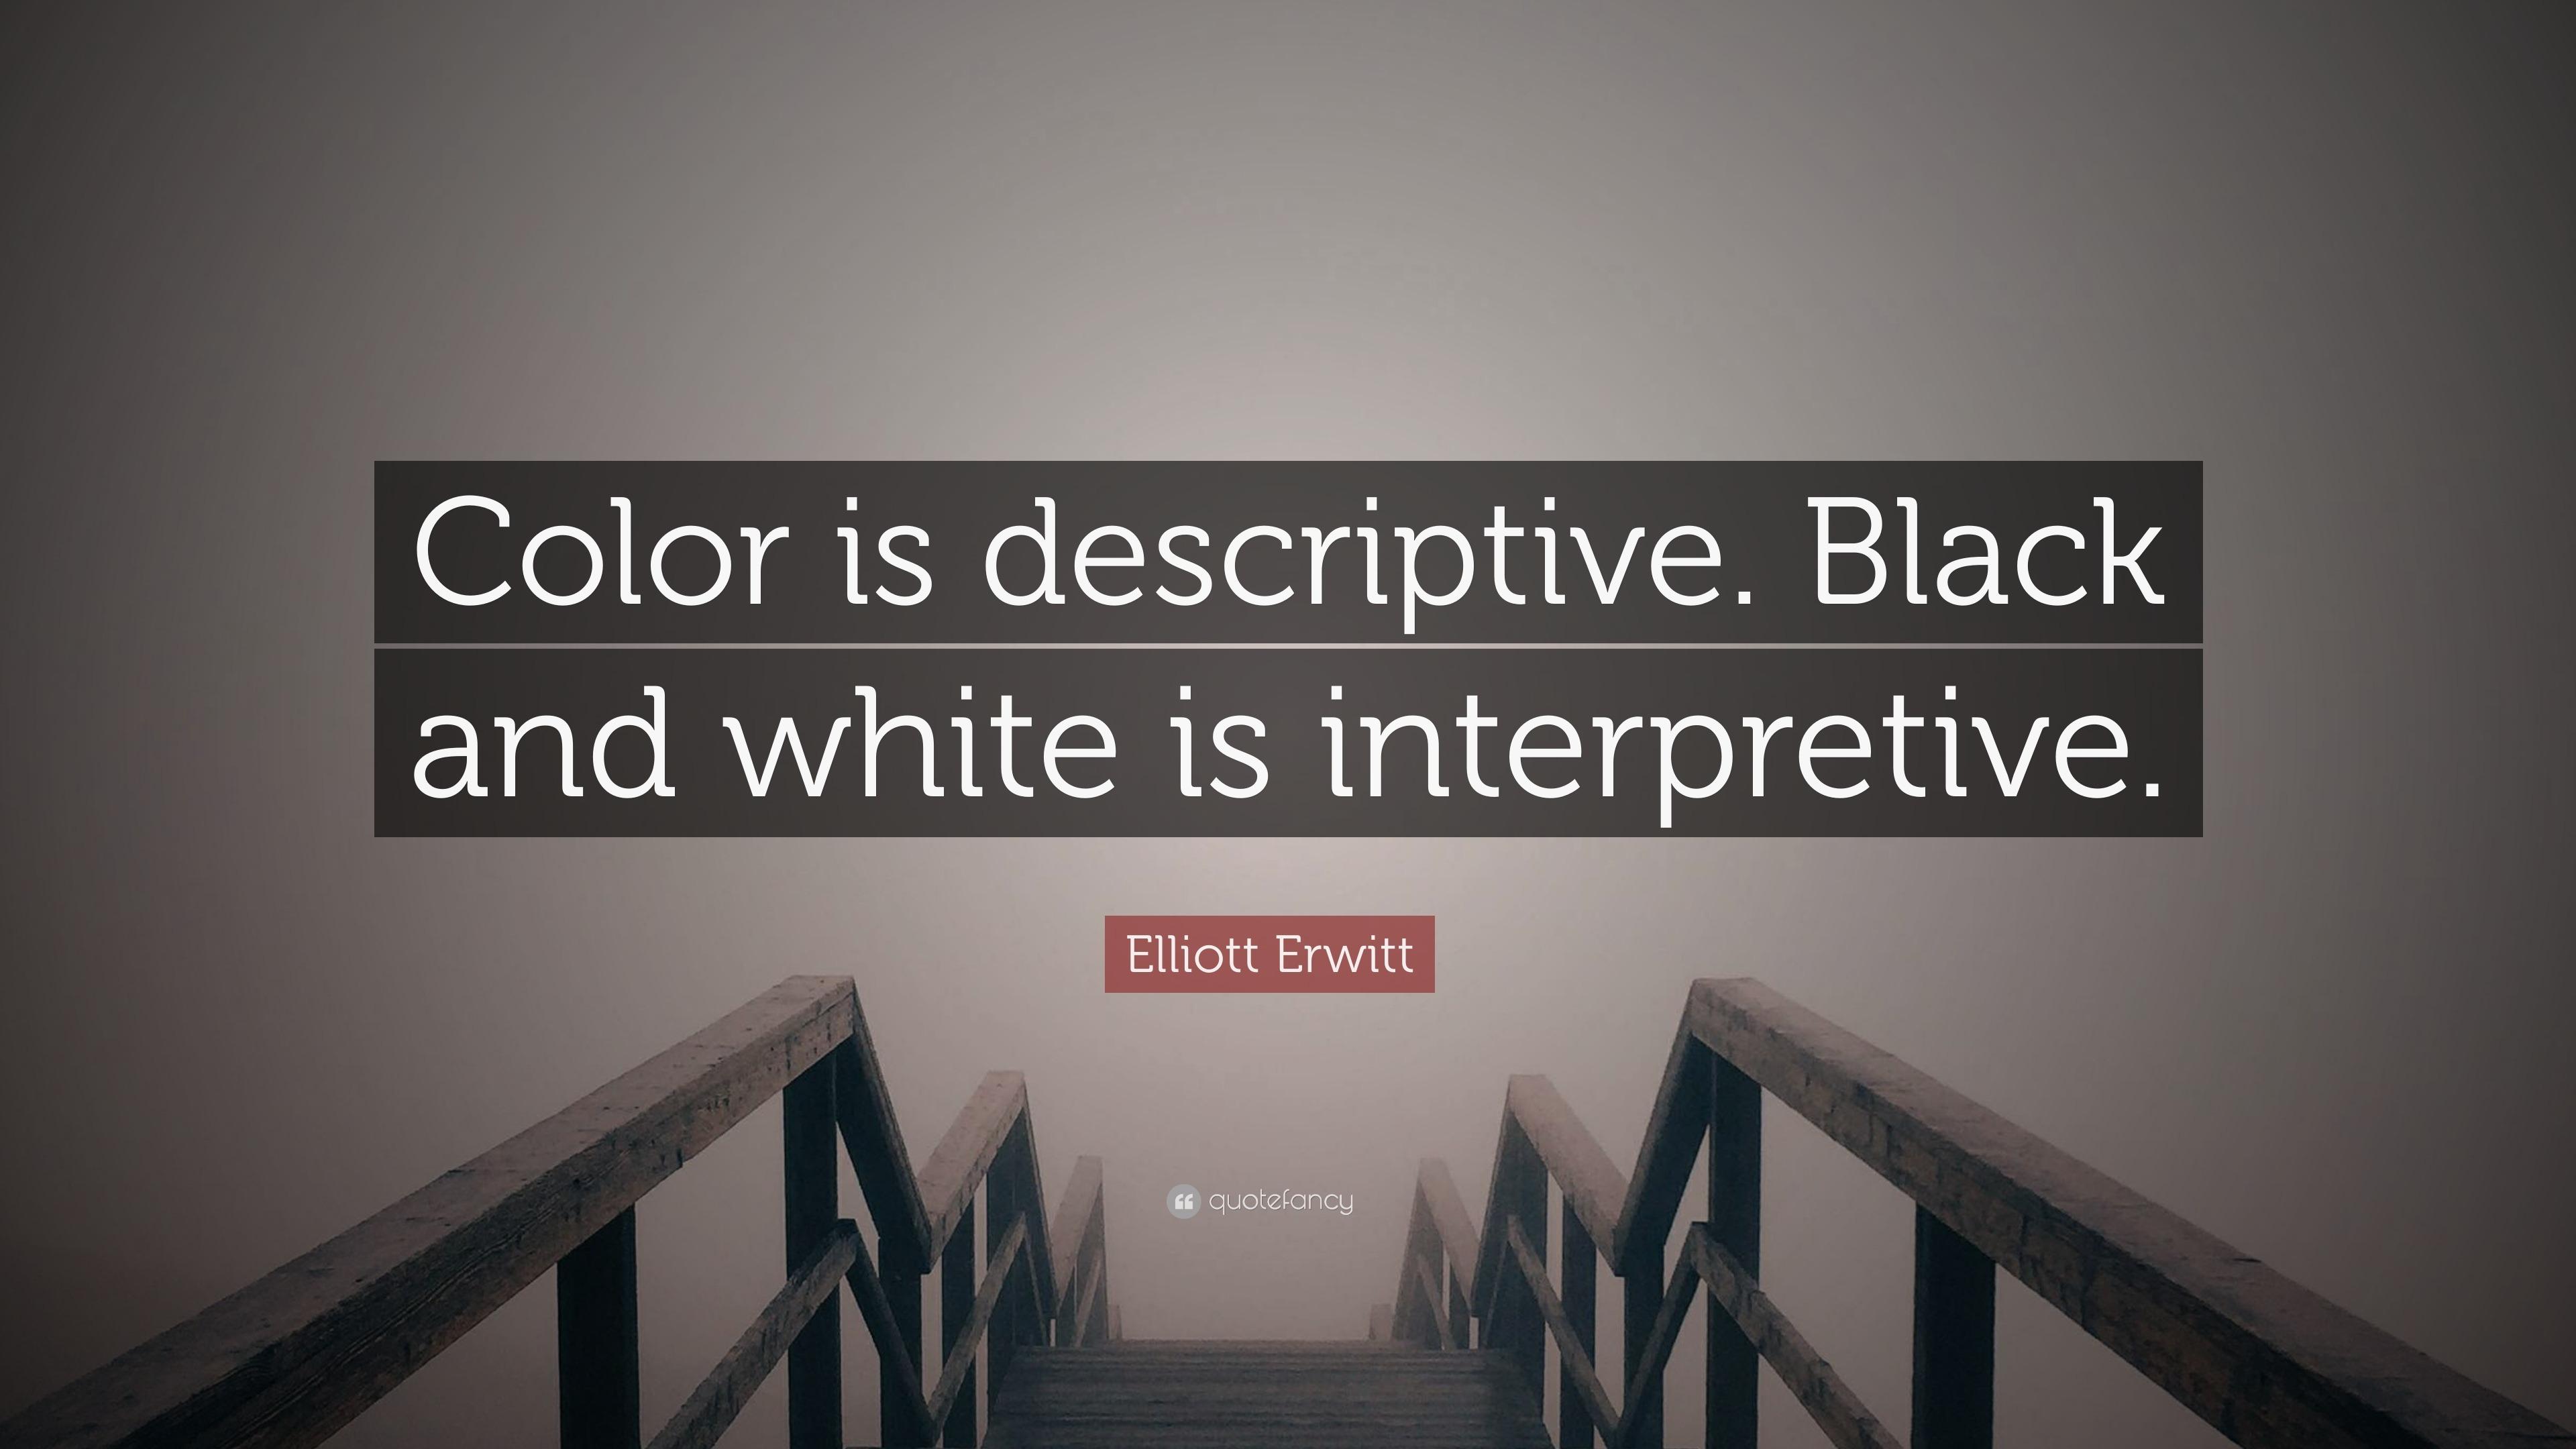 Elliott erwitt quote color is descriptive black and white is interpretive